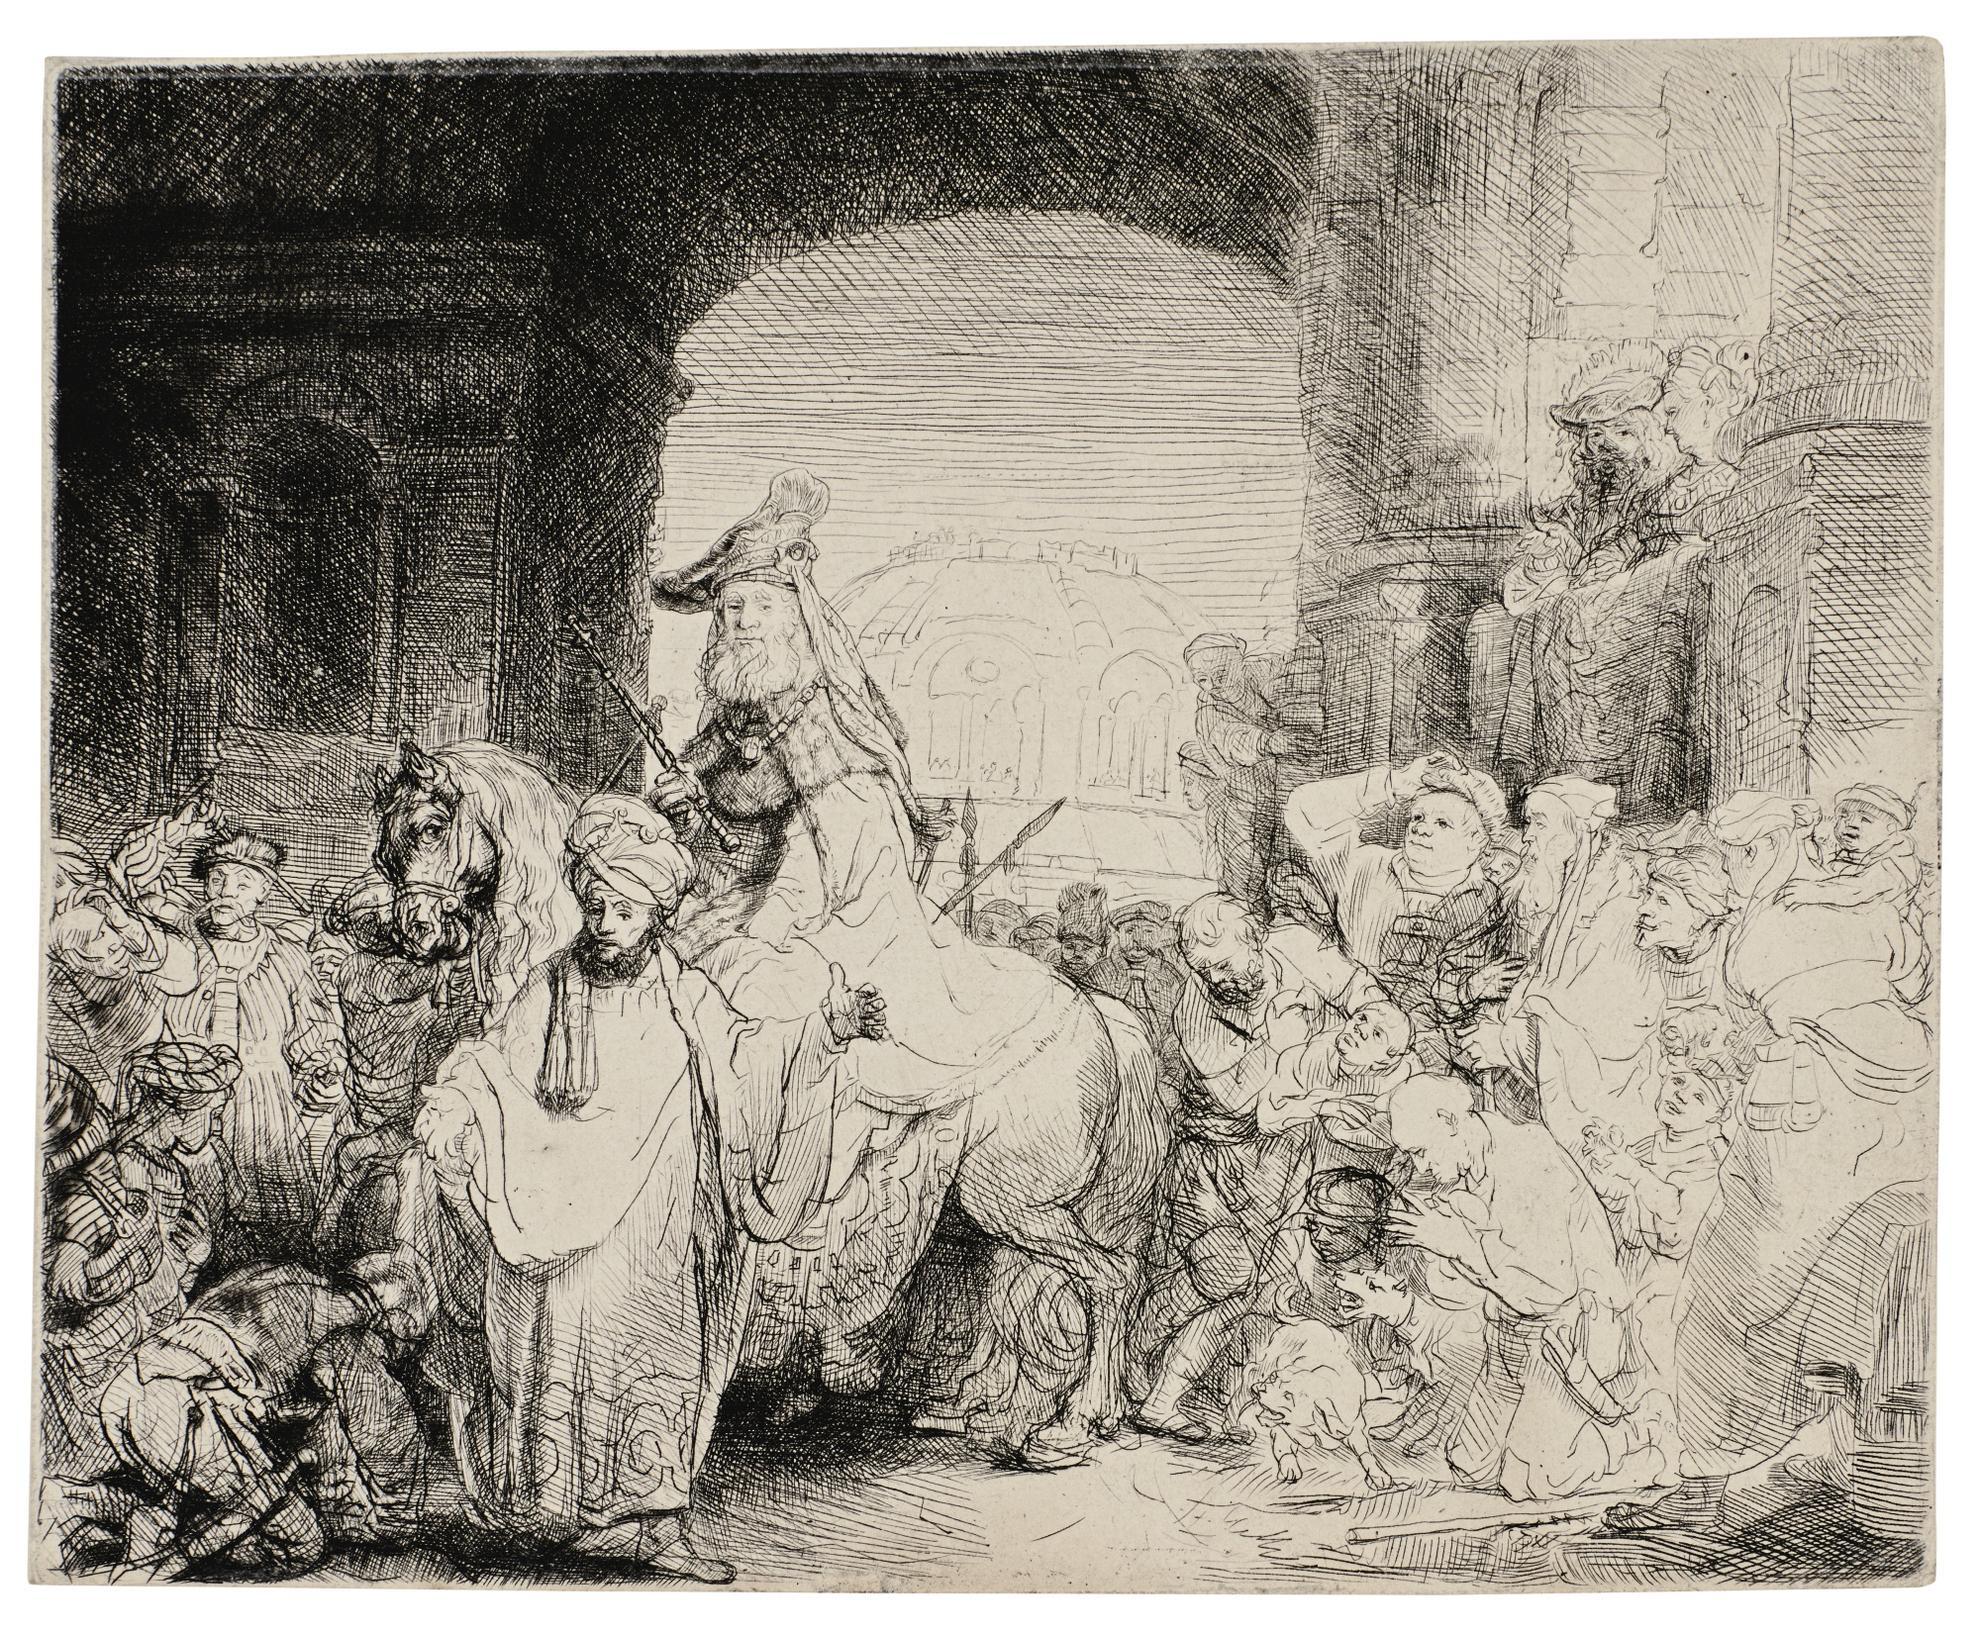 Rembrandt van Rijn-The Triumph Of Mordecai (B., Holl. 40; New Holl. 185; H. 172)-1641